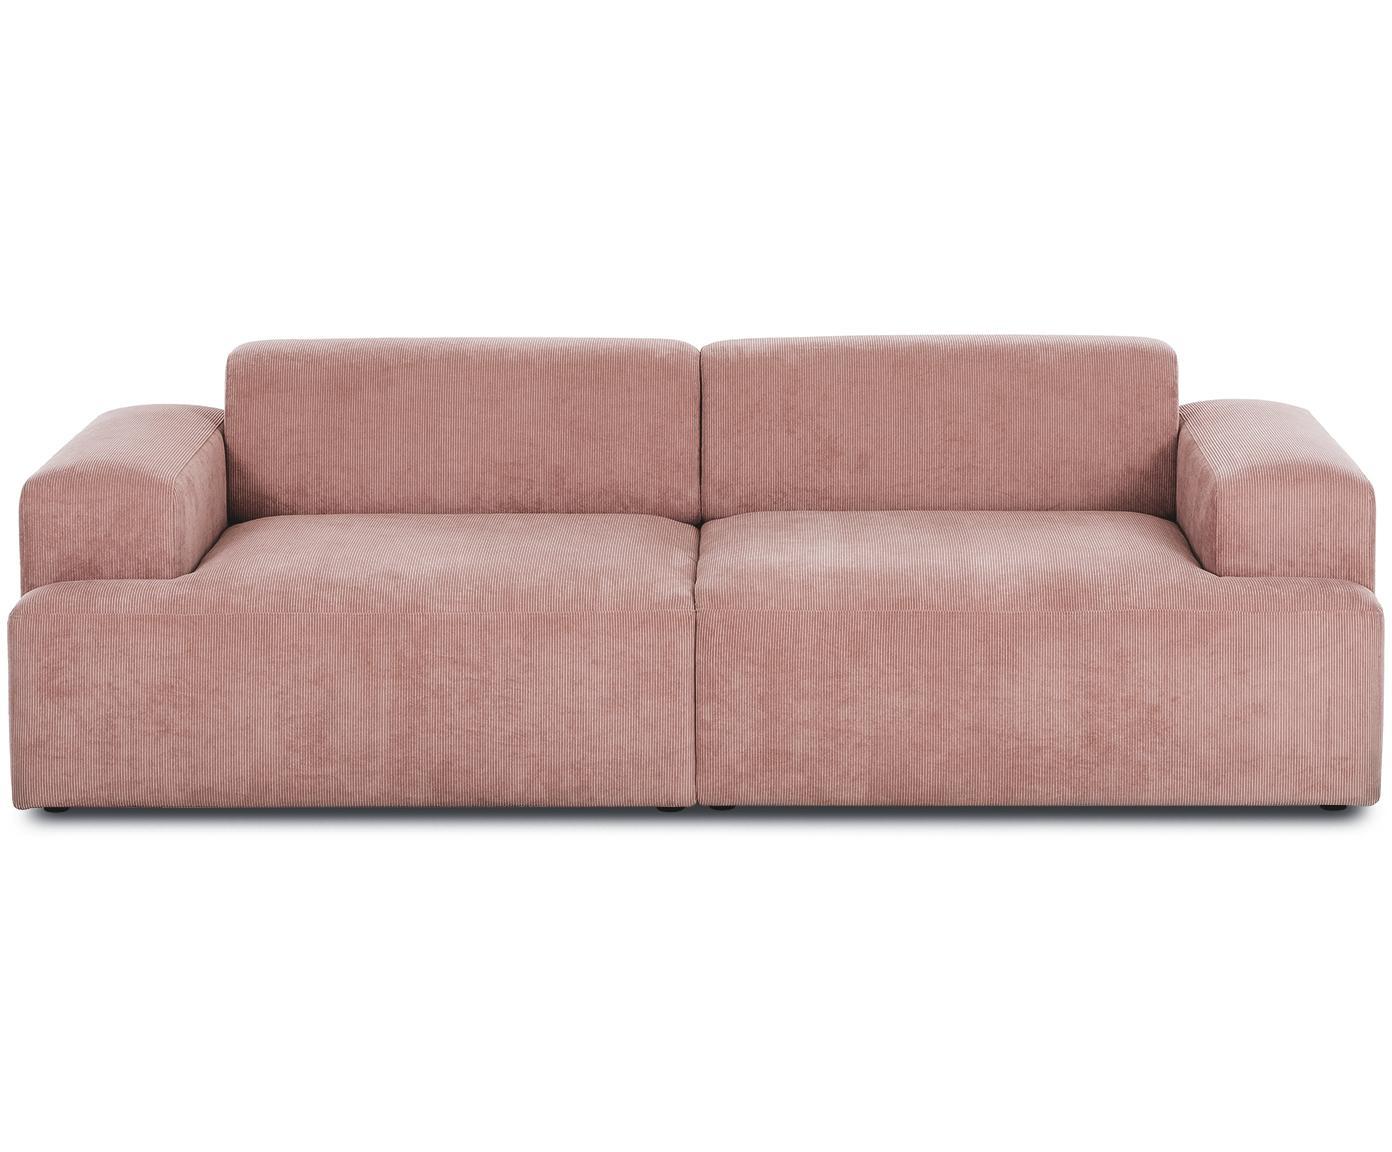 Cord-Sofa Melva (3-Sitzer), Bezug: Cord (92% Polyester, 8% P, Gestell: Massives Kiefernholz, Spa, Cord Rosa, B 240 x T 101 cm